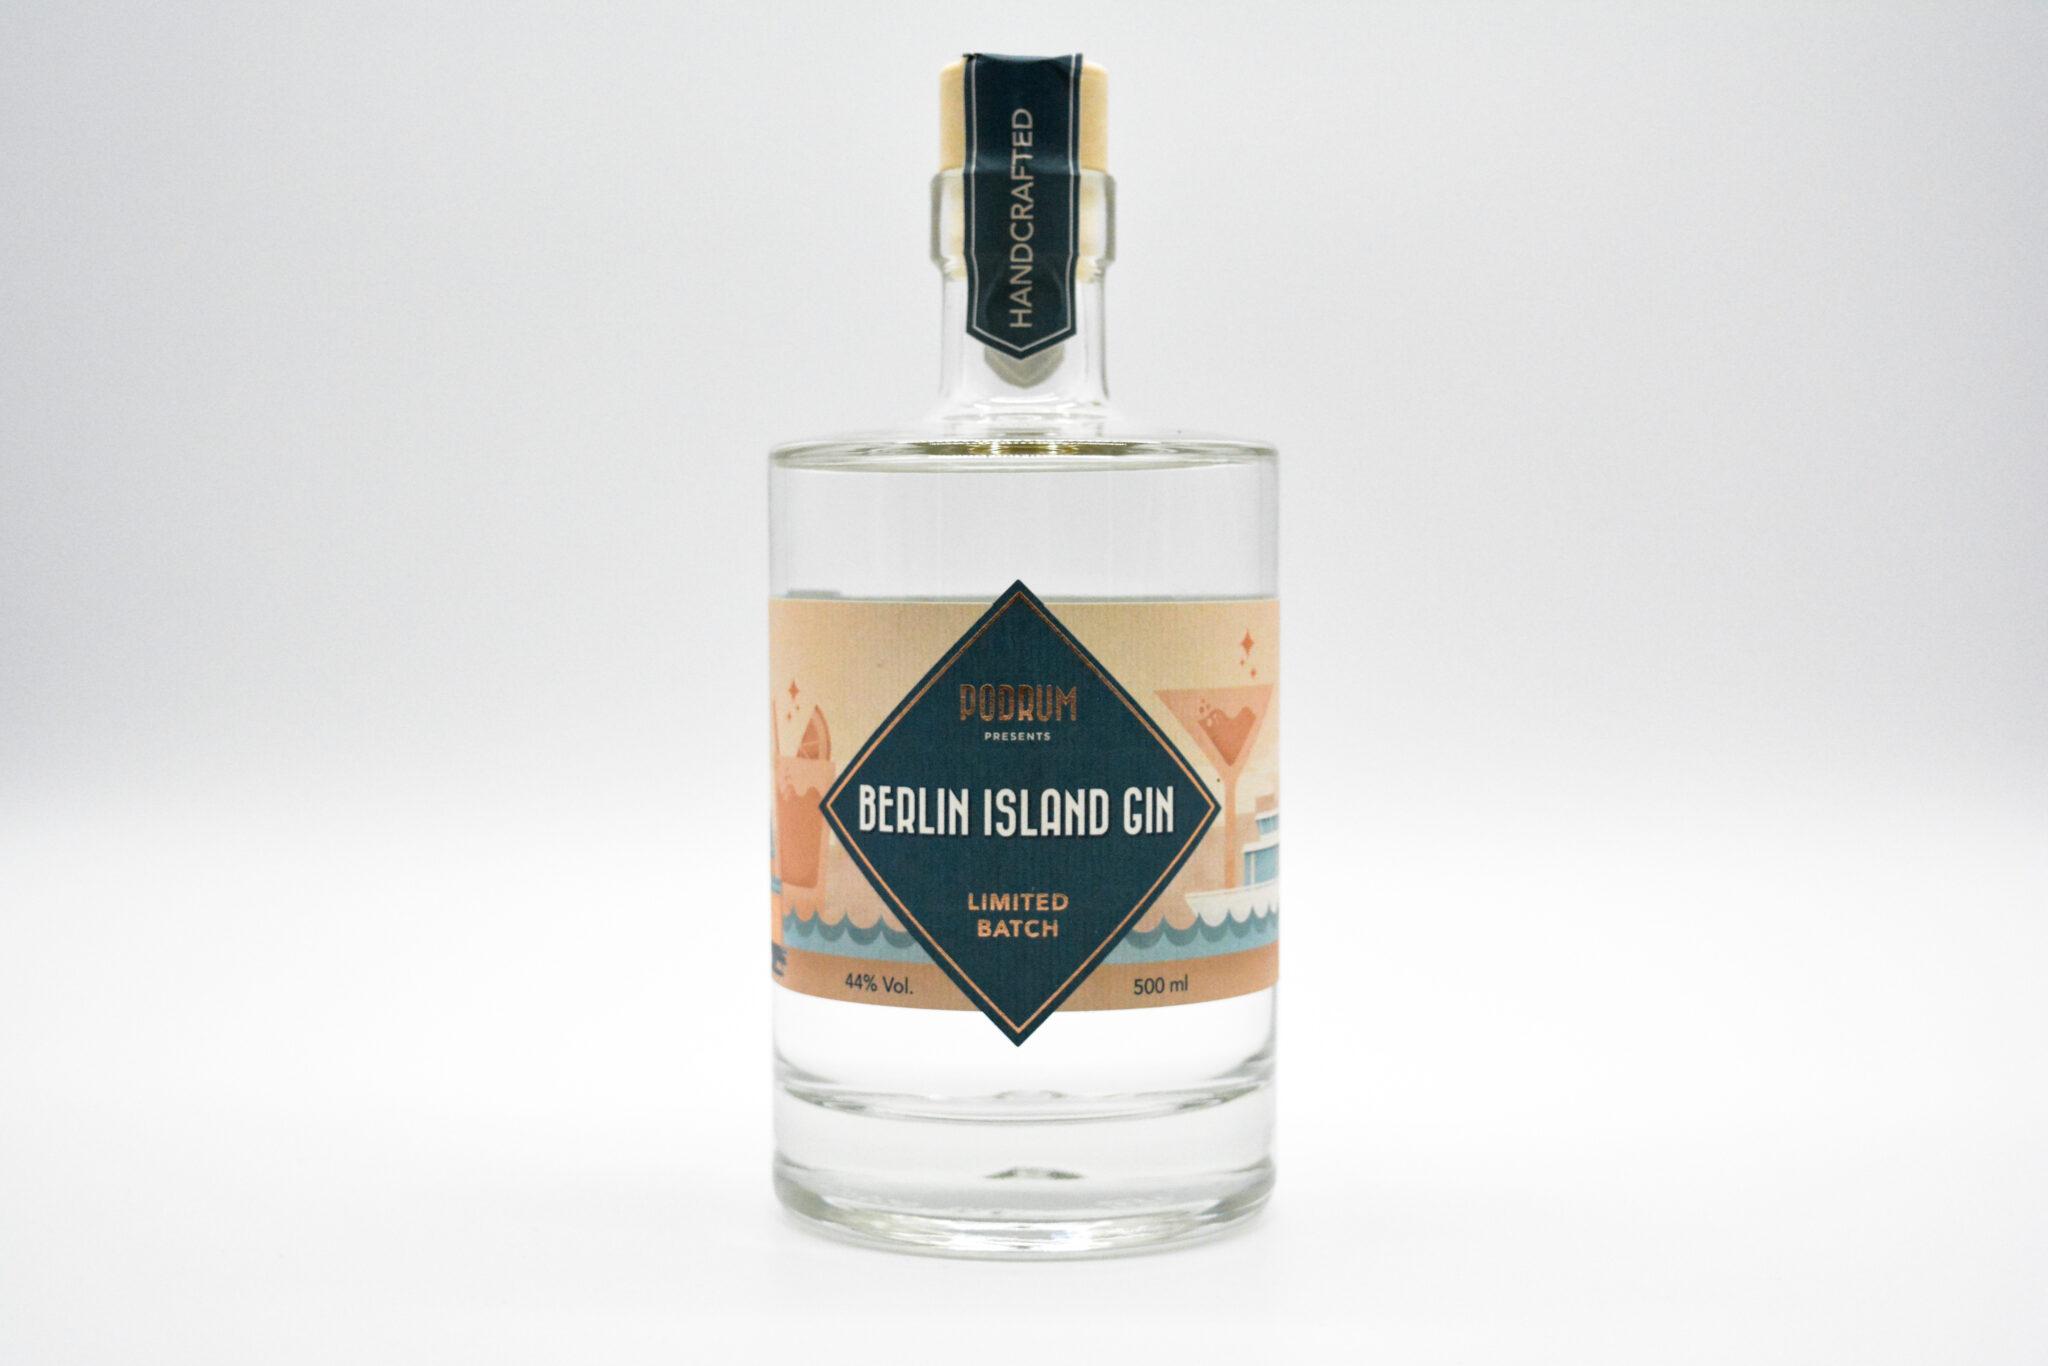 Berlin Island Gin 44% Vol.